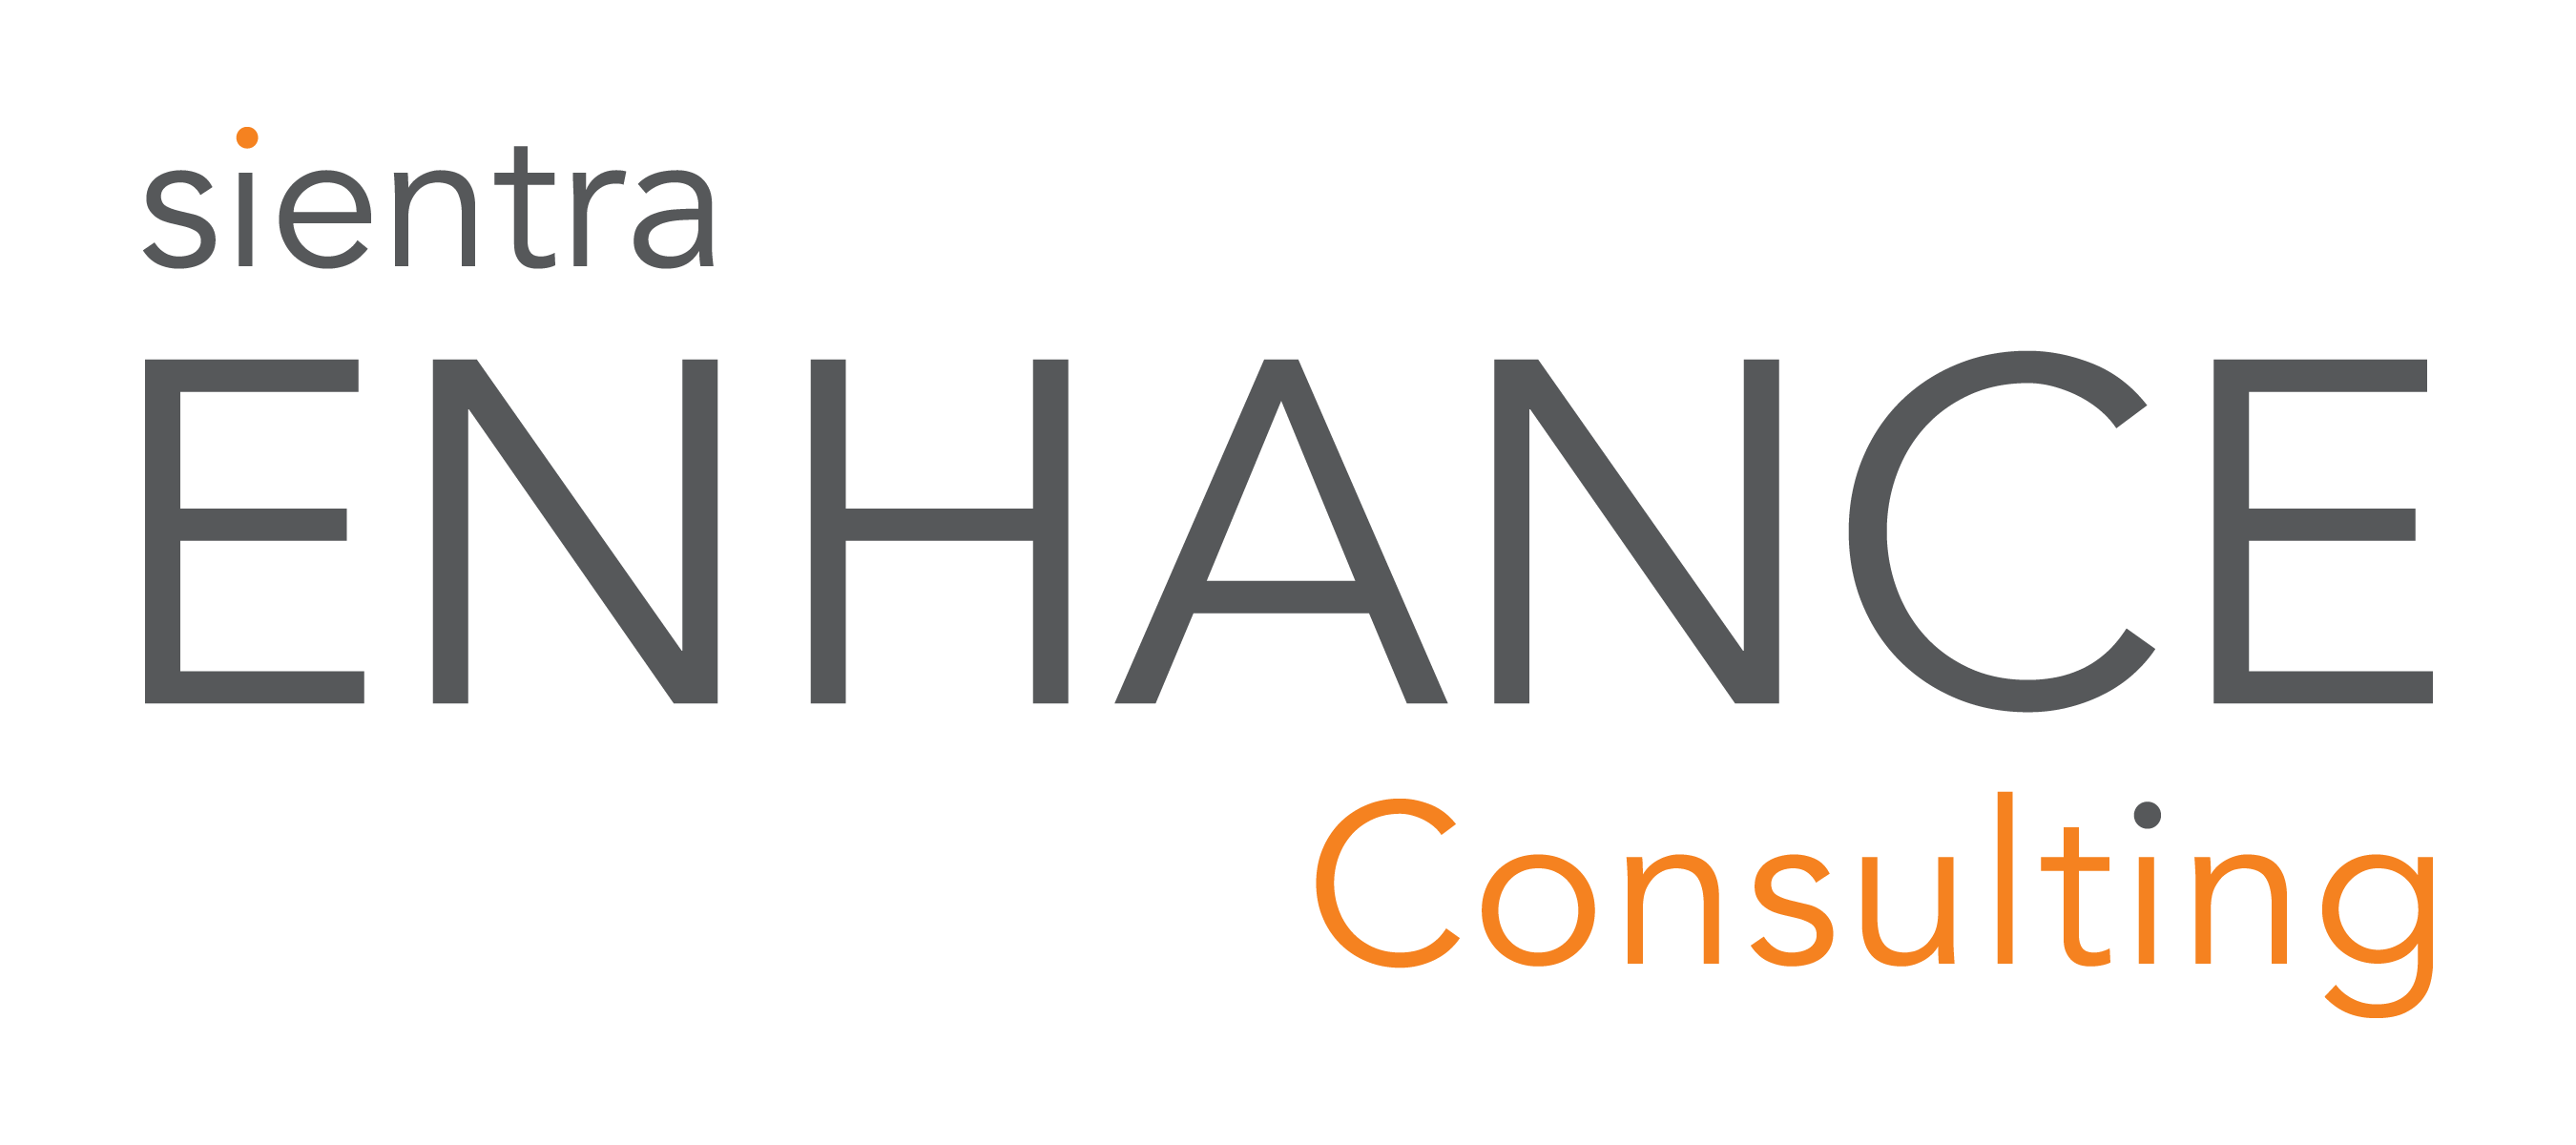 enhance_consulting_logo